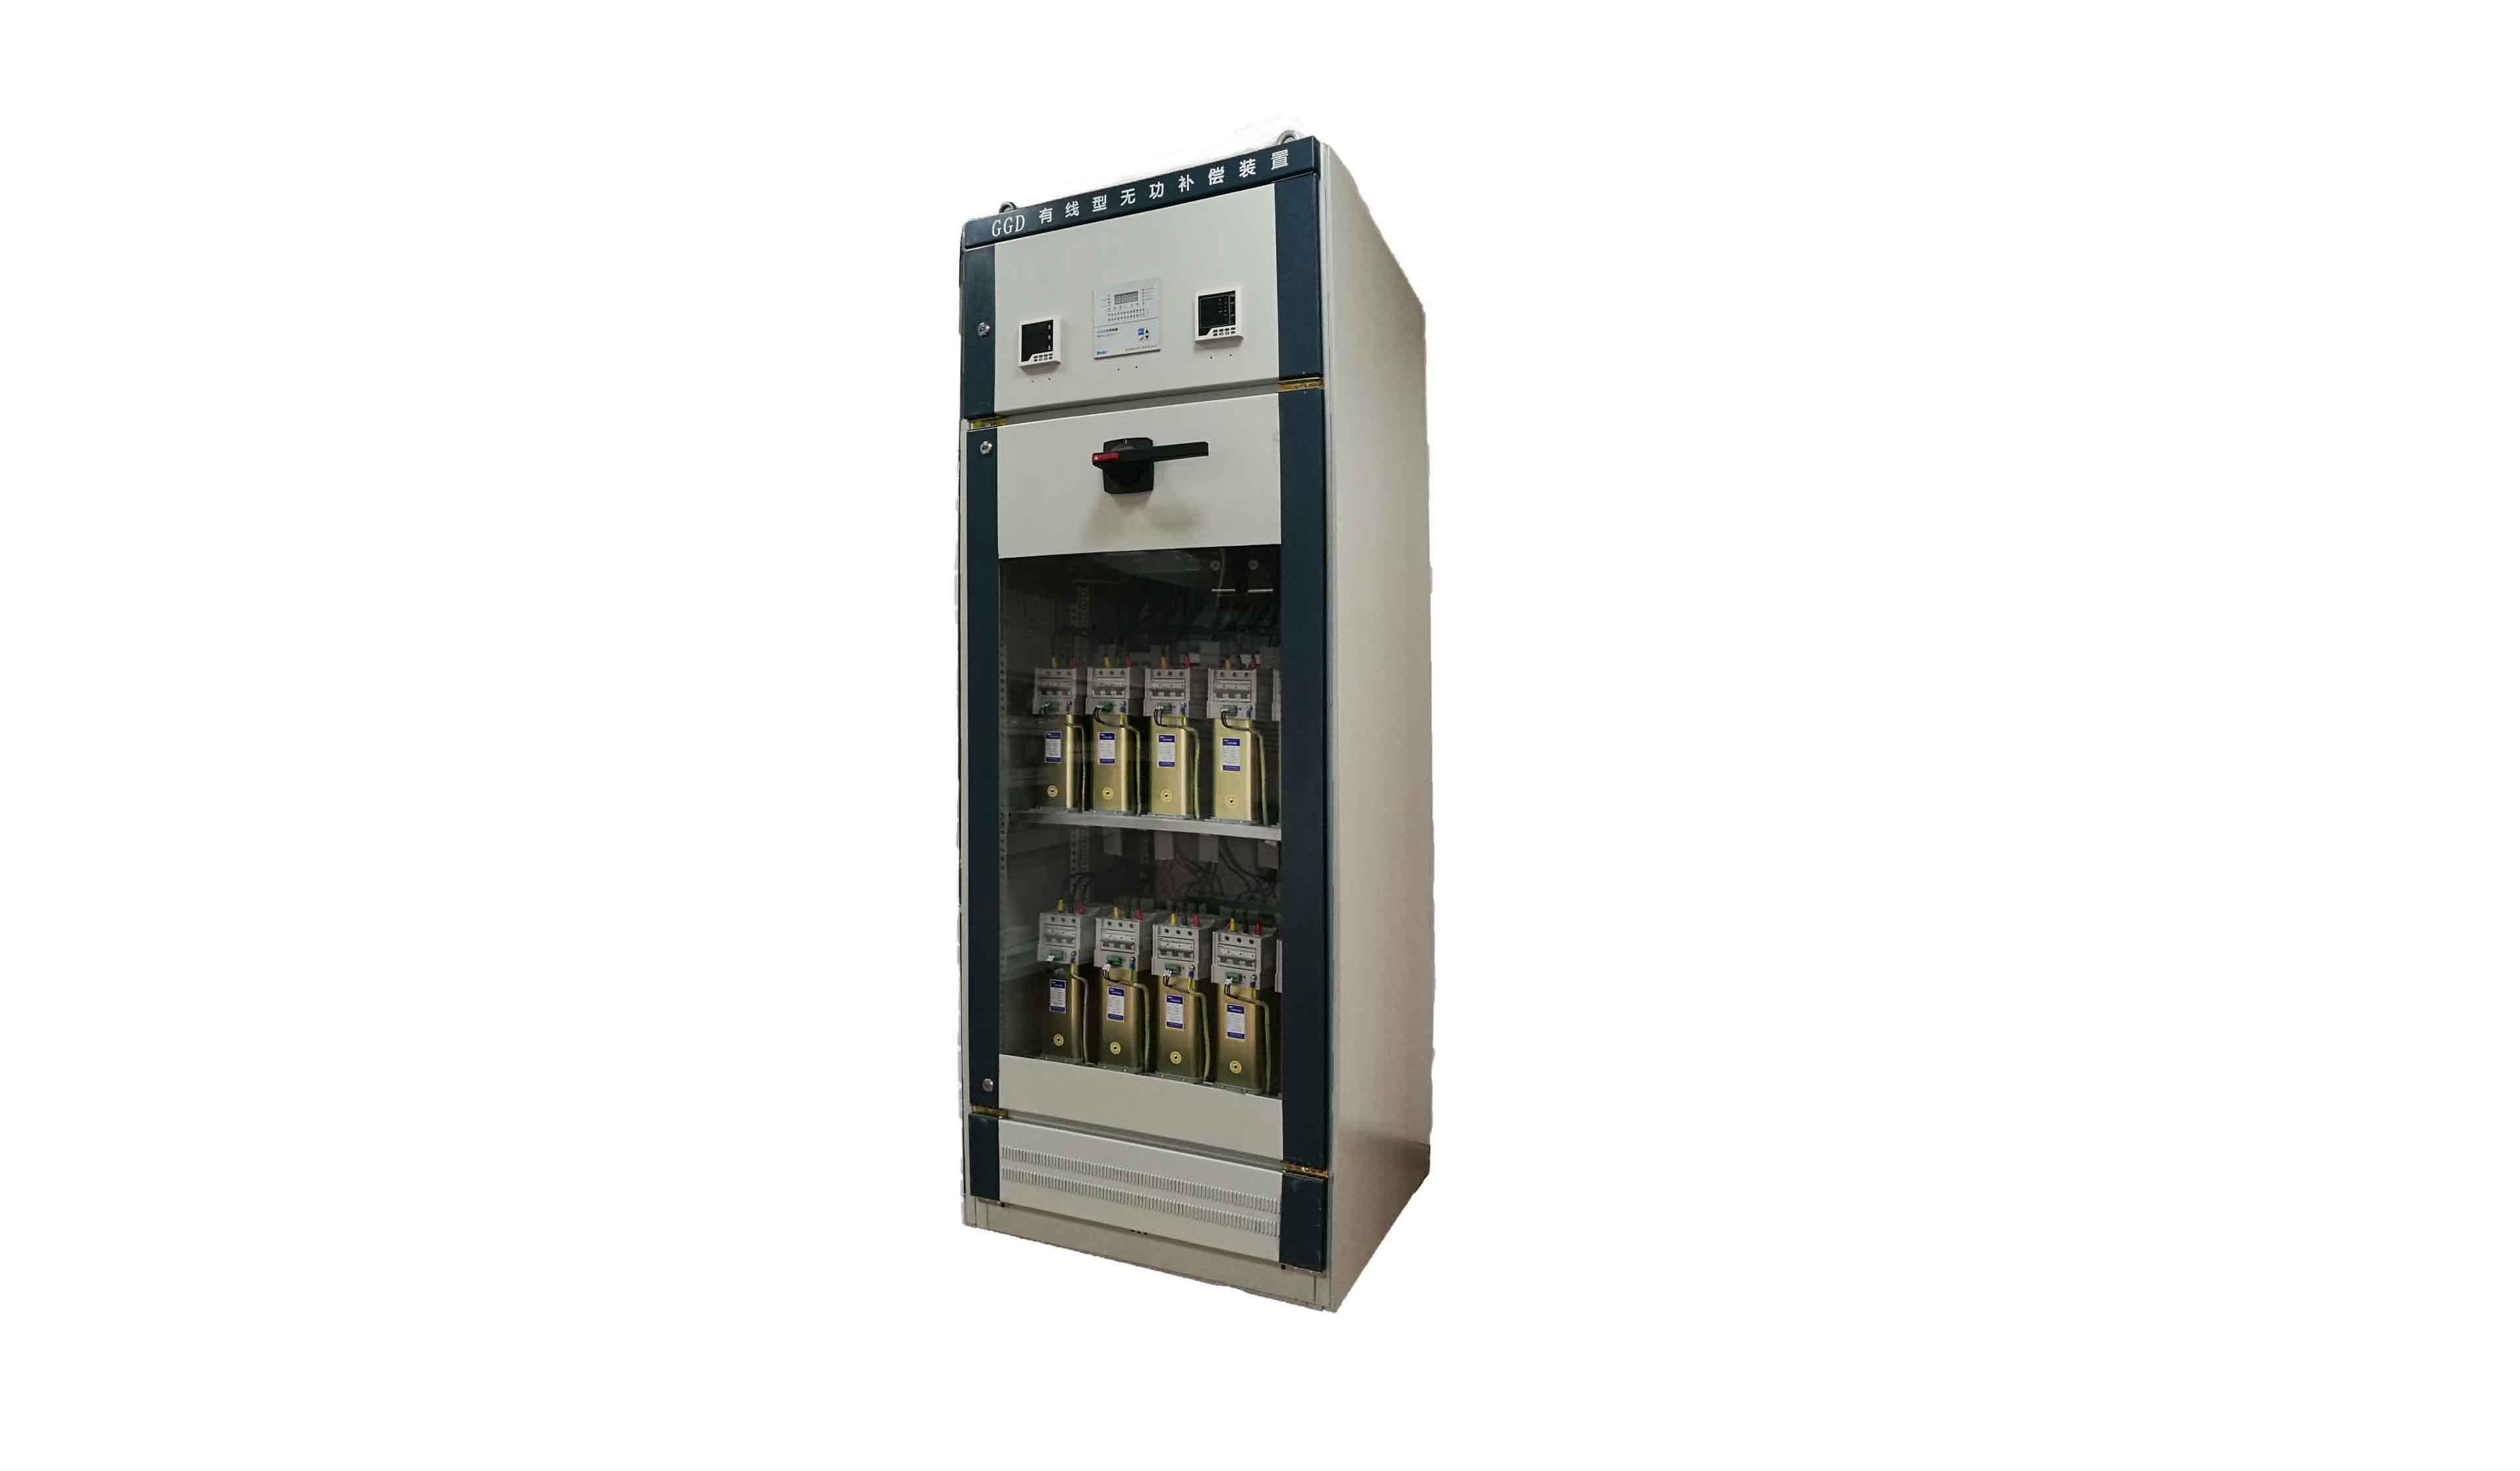 MJDG-D系列低压动态无功补偿柜